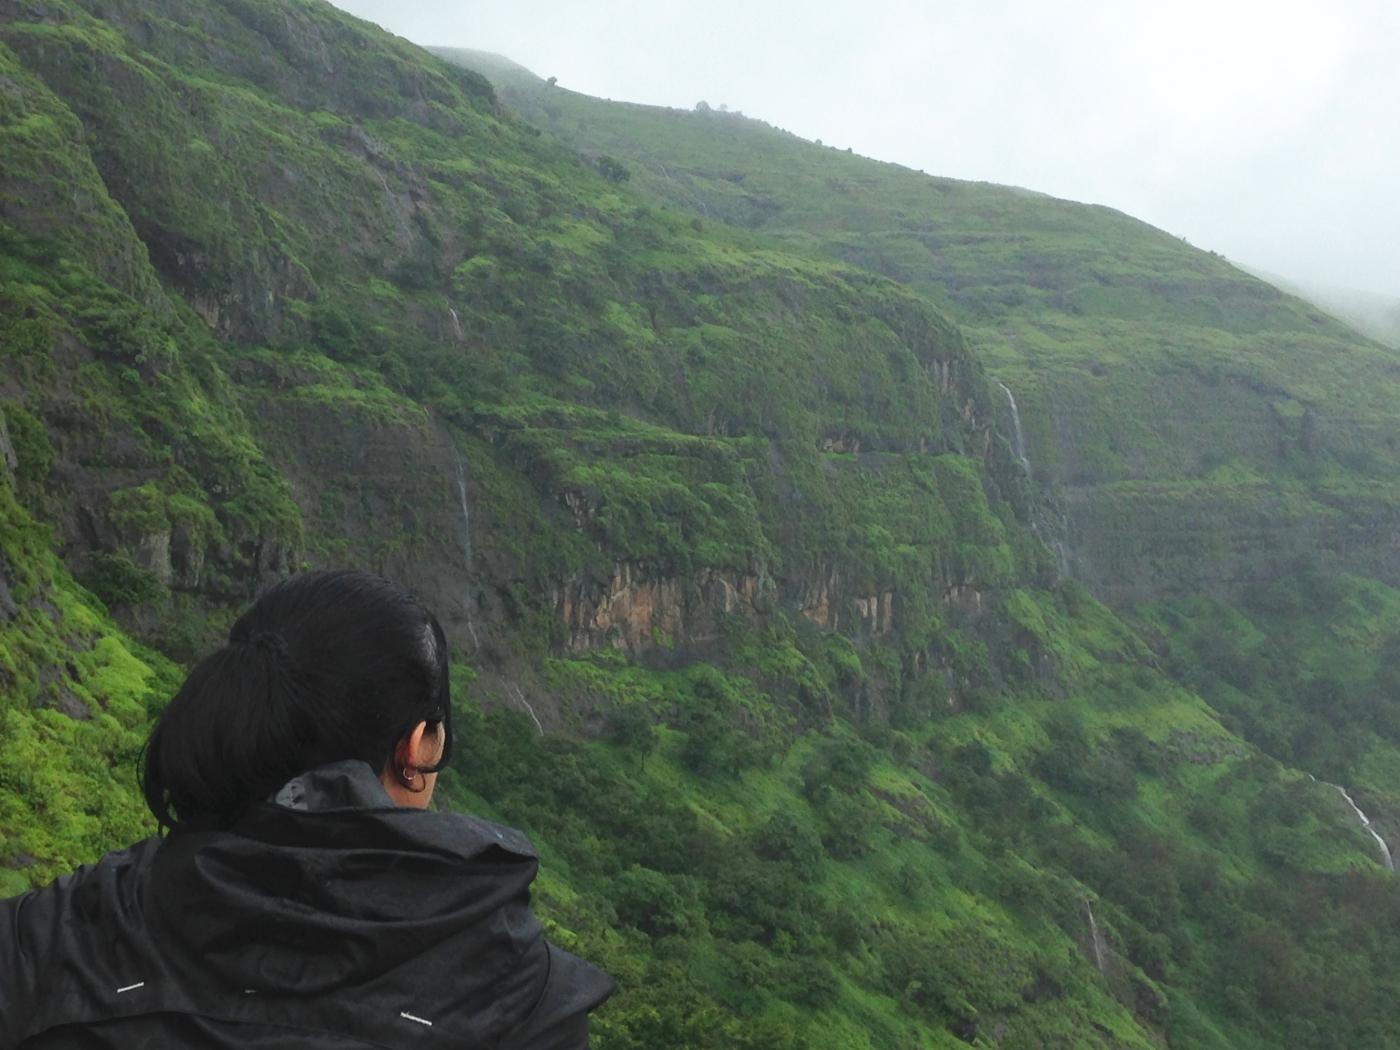 Emerald hills of Western Ghats